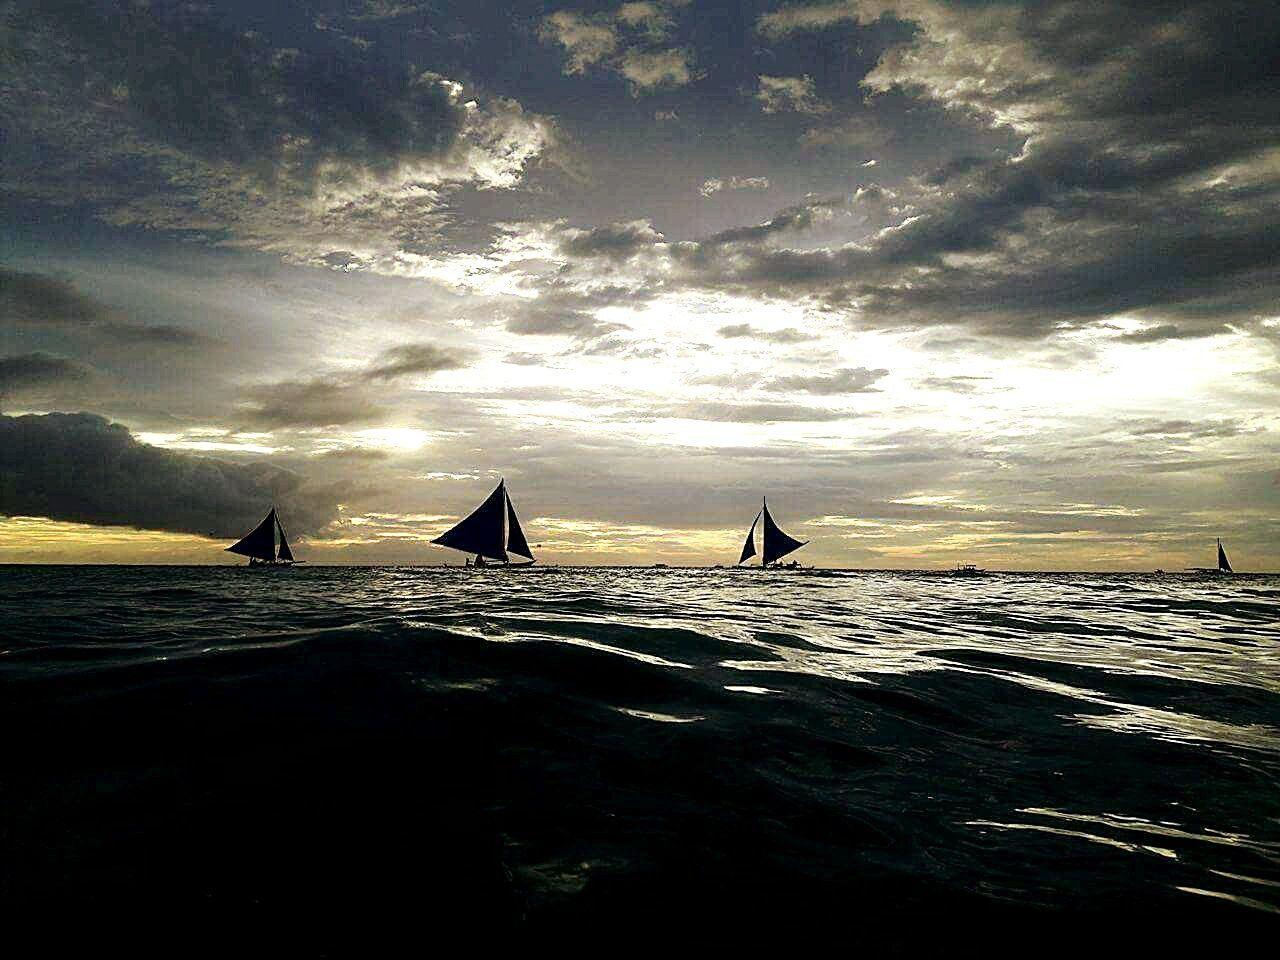 Sea Travel Water Sunset Nautical Vessel Sailing Wave Sailboat No People Outdoors Nature Regatta Day